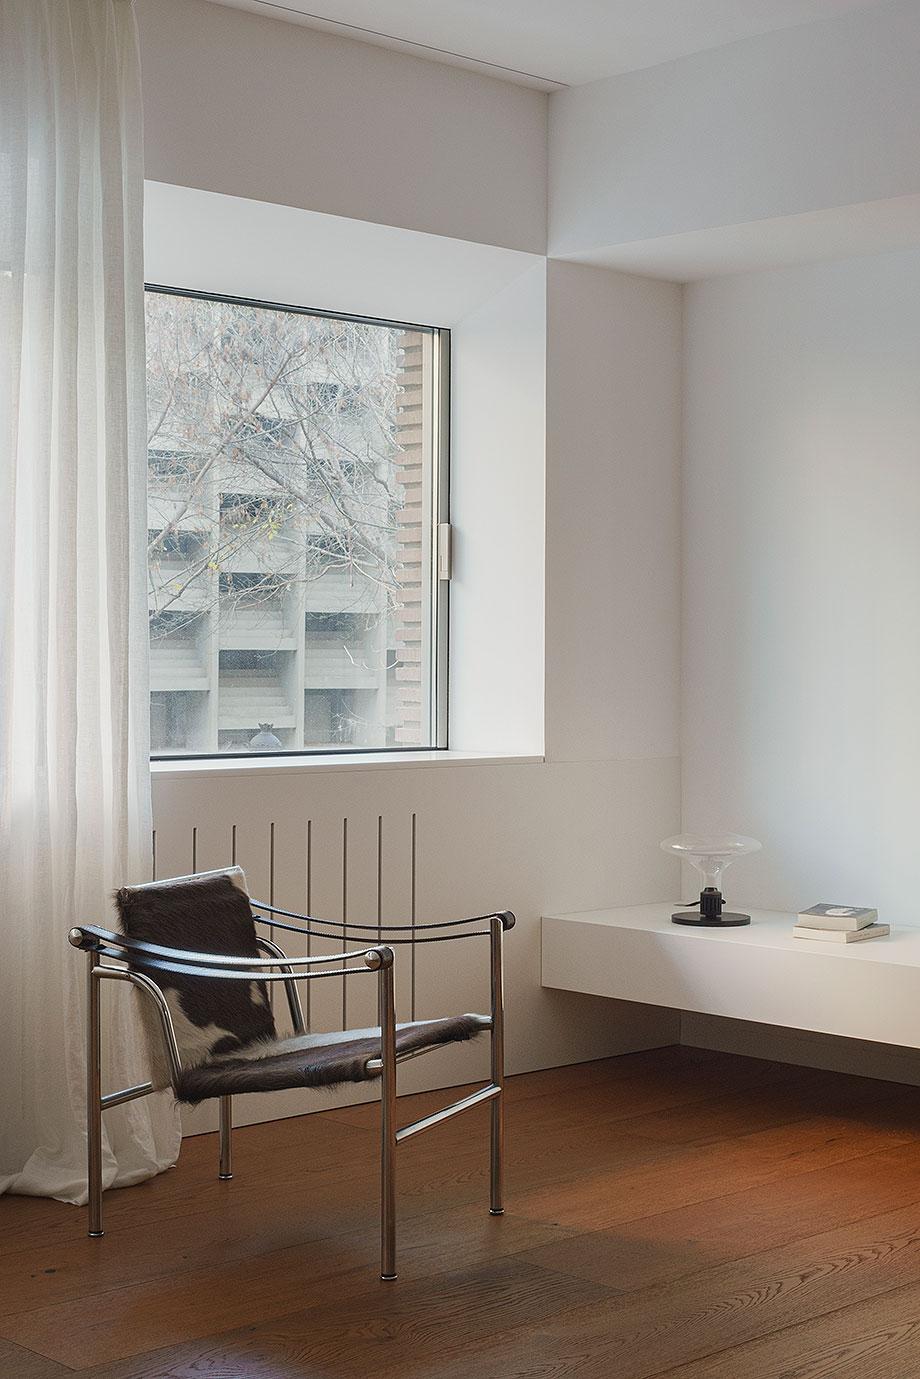 vivienda en artes graficas valencia por balzar arquitectos (4) - foto david zarzoso